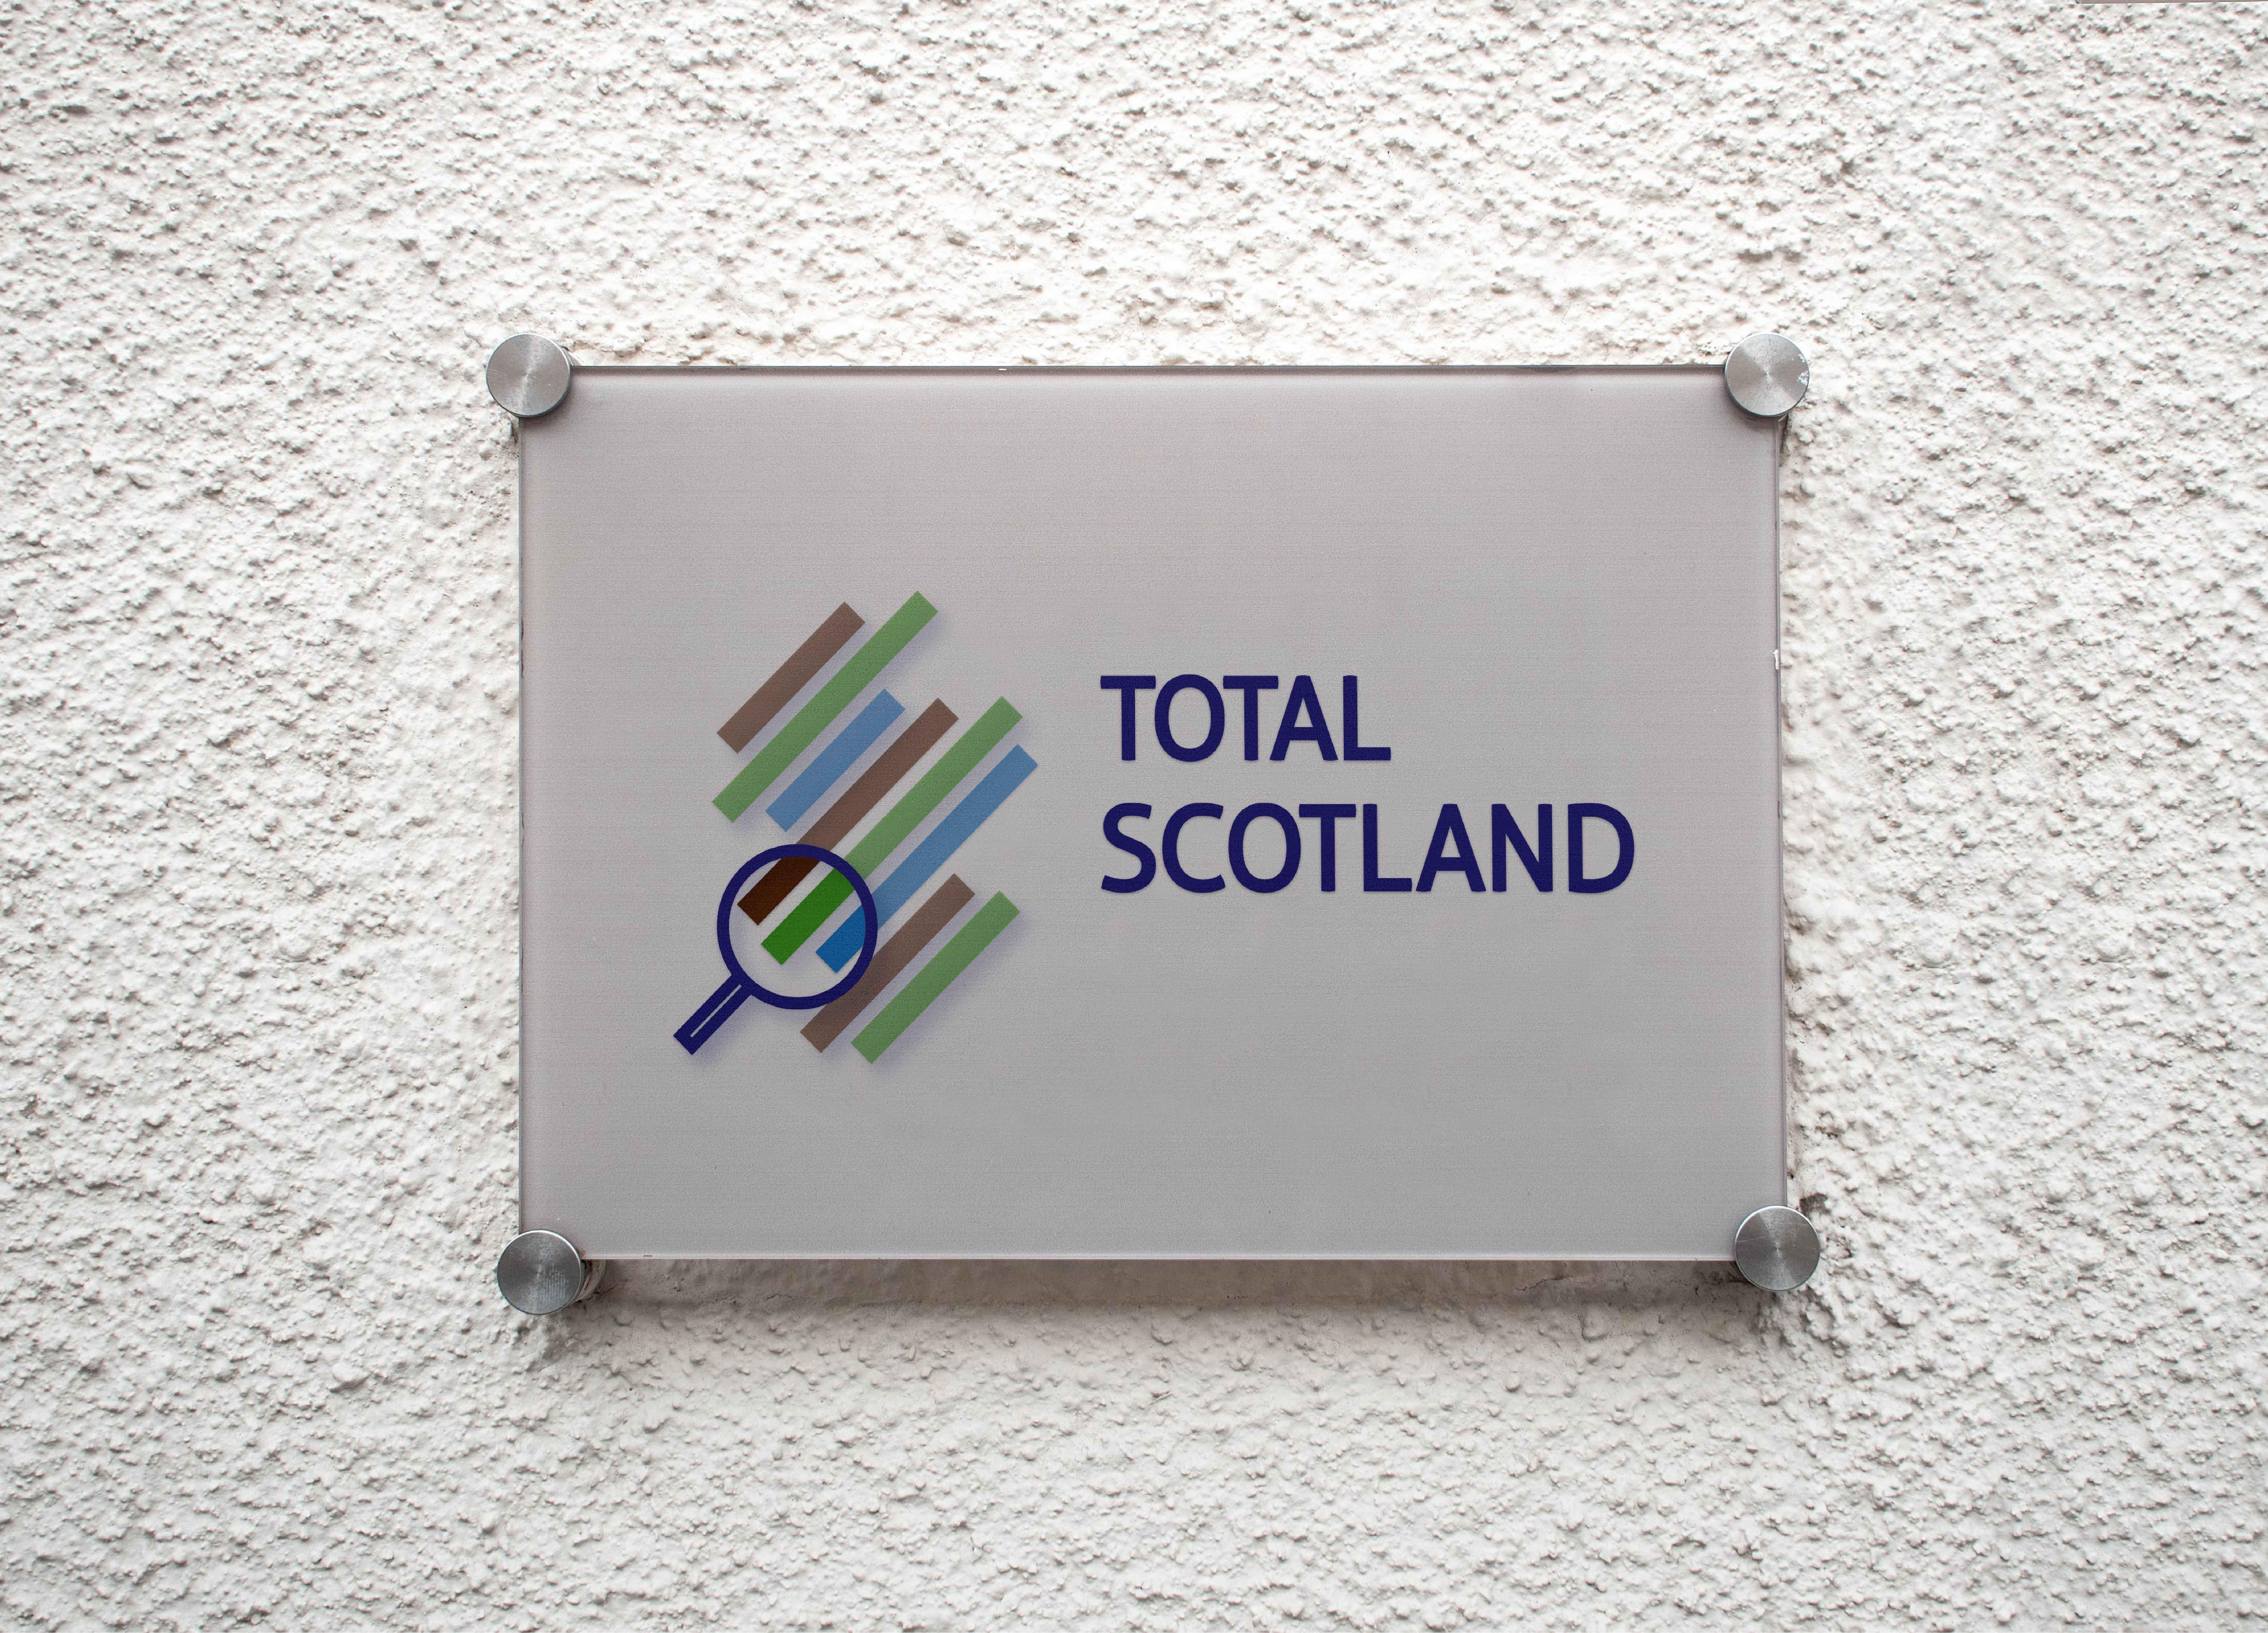 Total Scotland